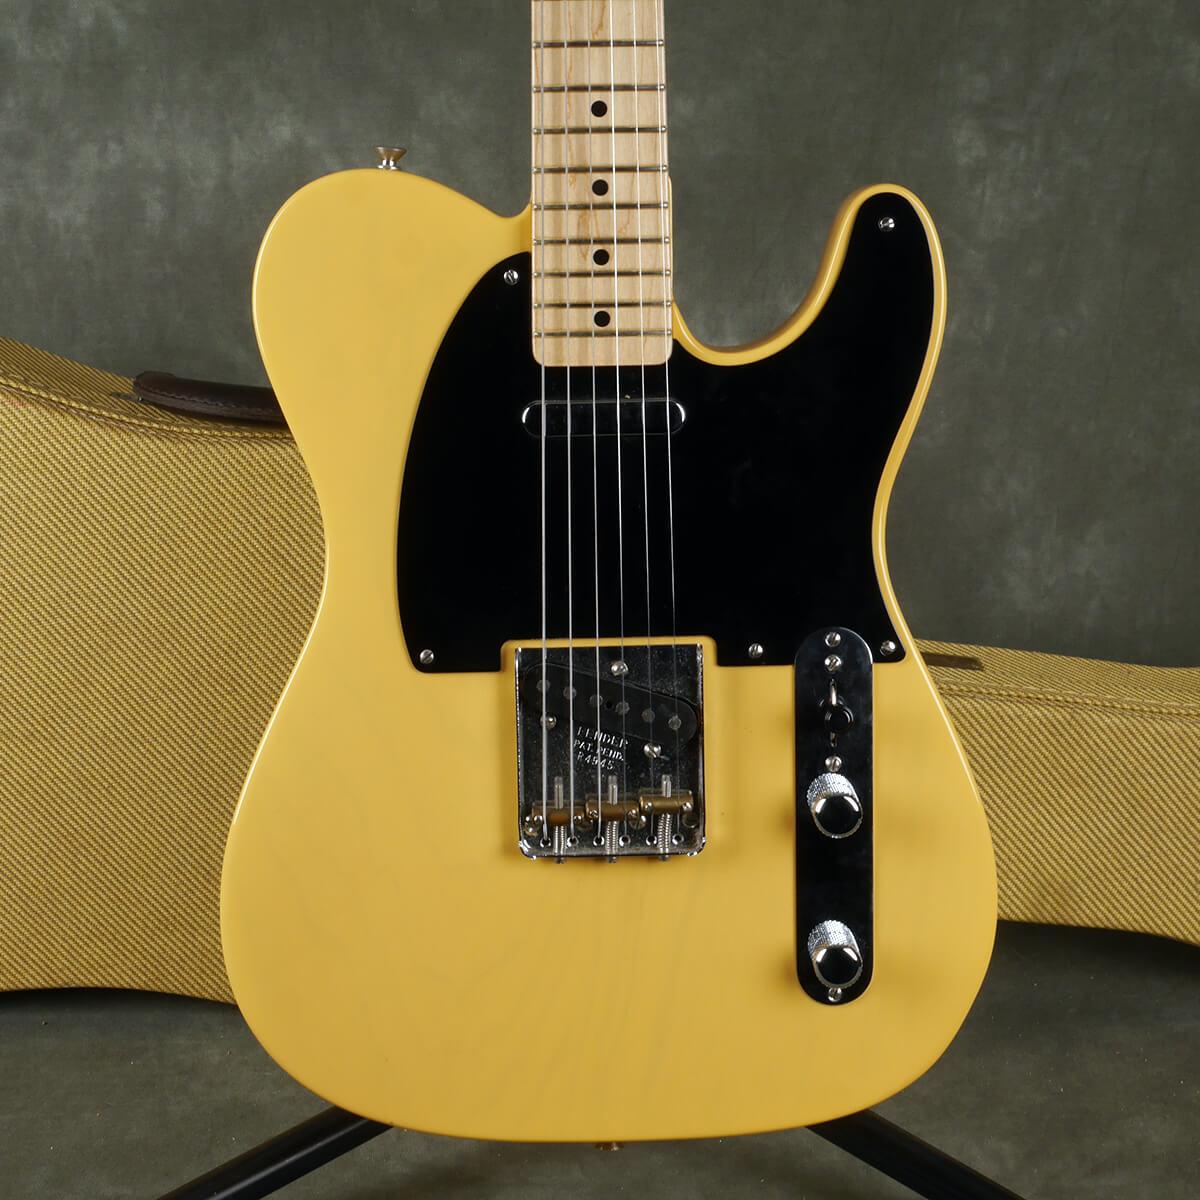 Fender Custom Shop 51 Nocaster NOS - Butterscotch Blonde w/Hard Case - 2nd Hand